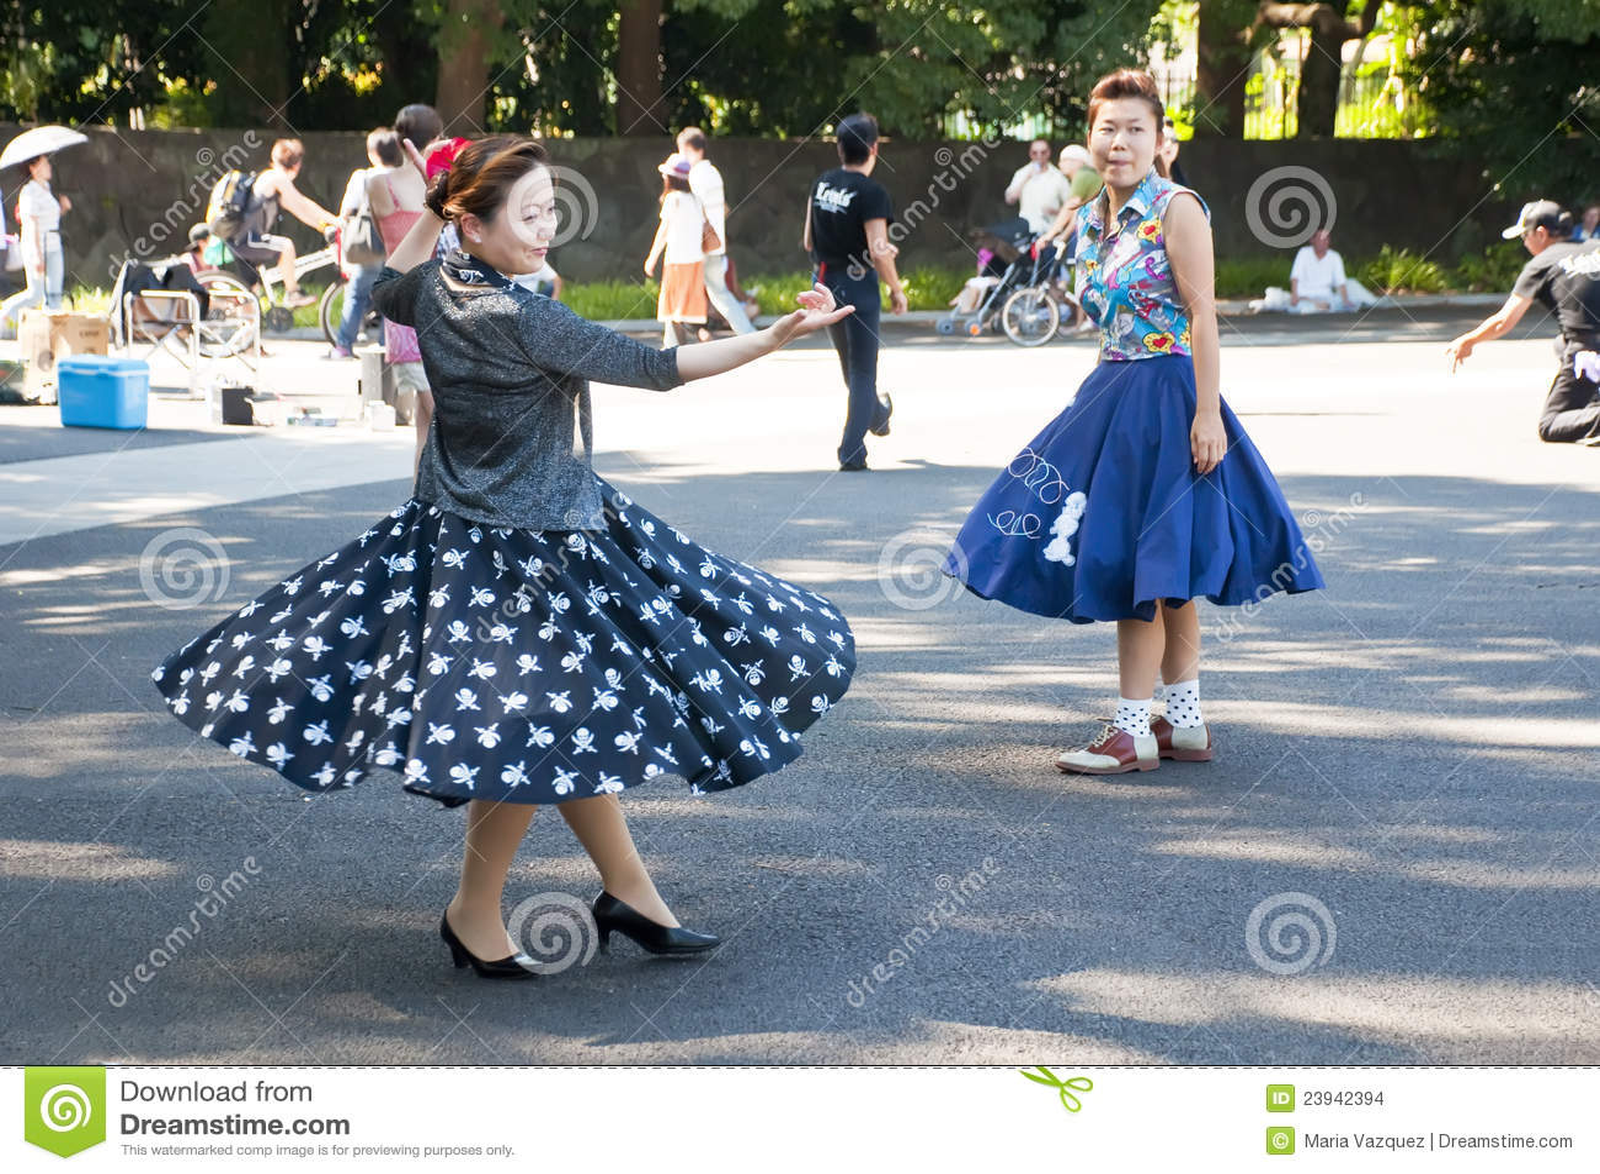 Japanese dancing in Yoyogi Park, Japan